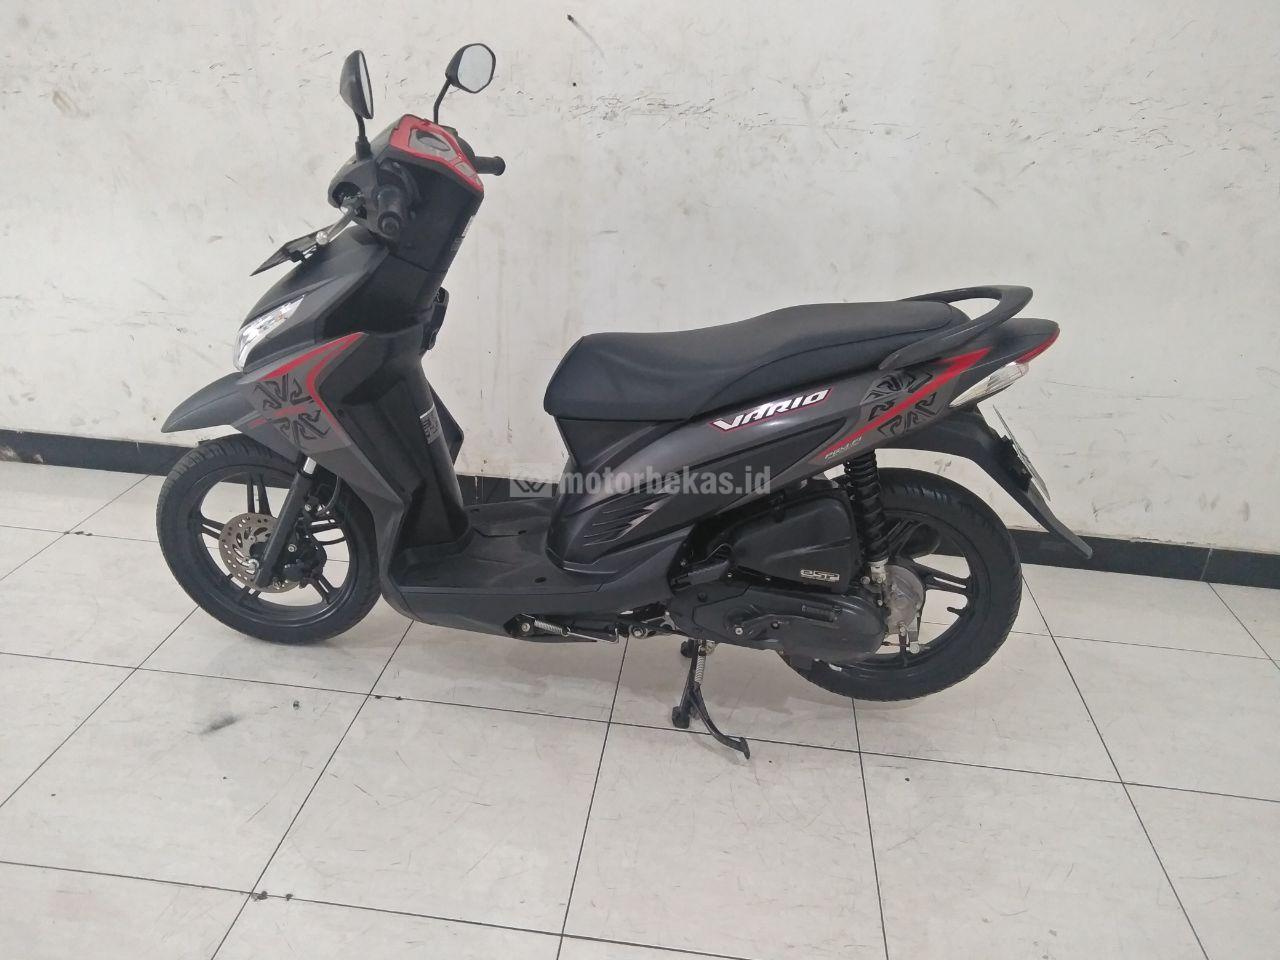 HONDA VARIO 110 LED  4314 motorbekas.id